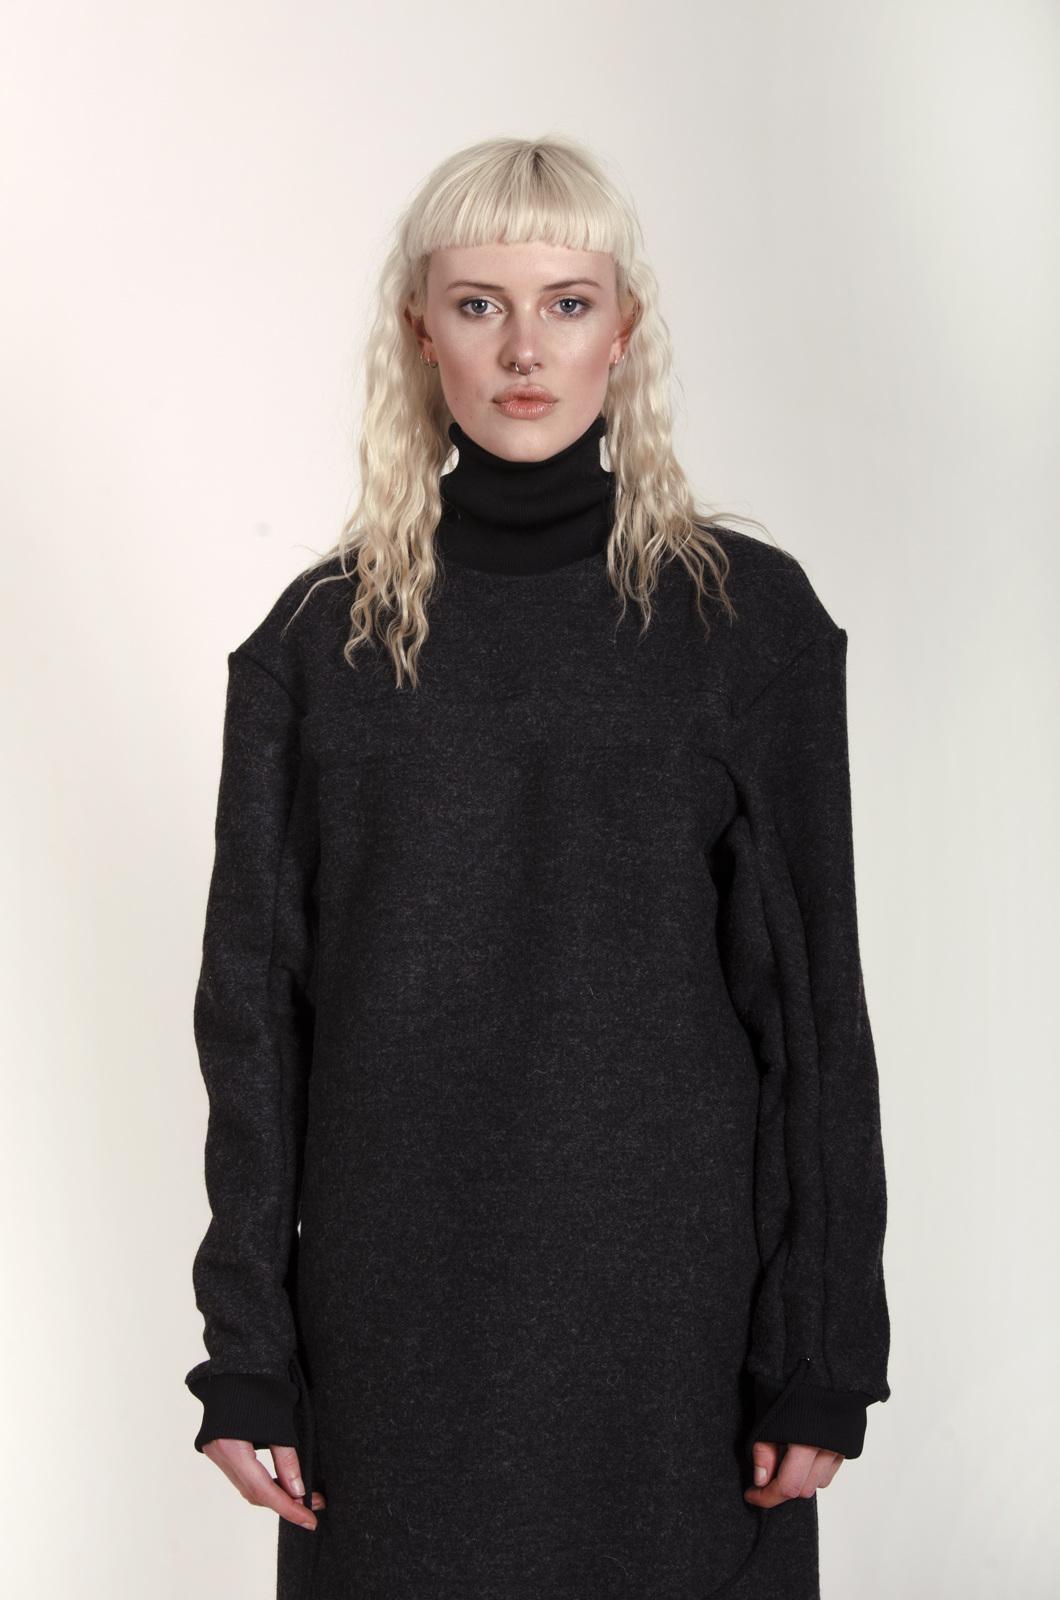 Jack Hill Fashion